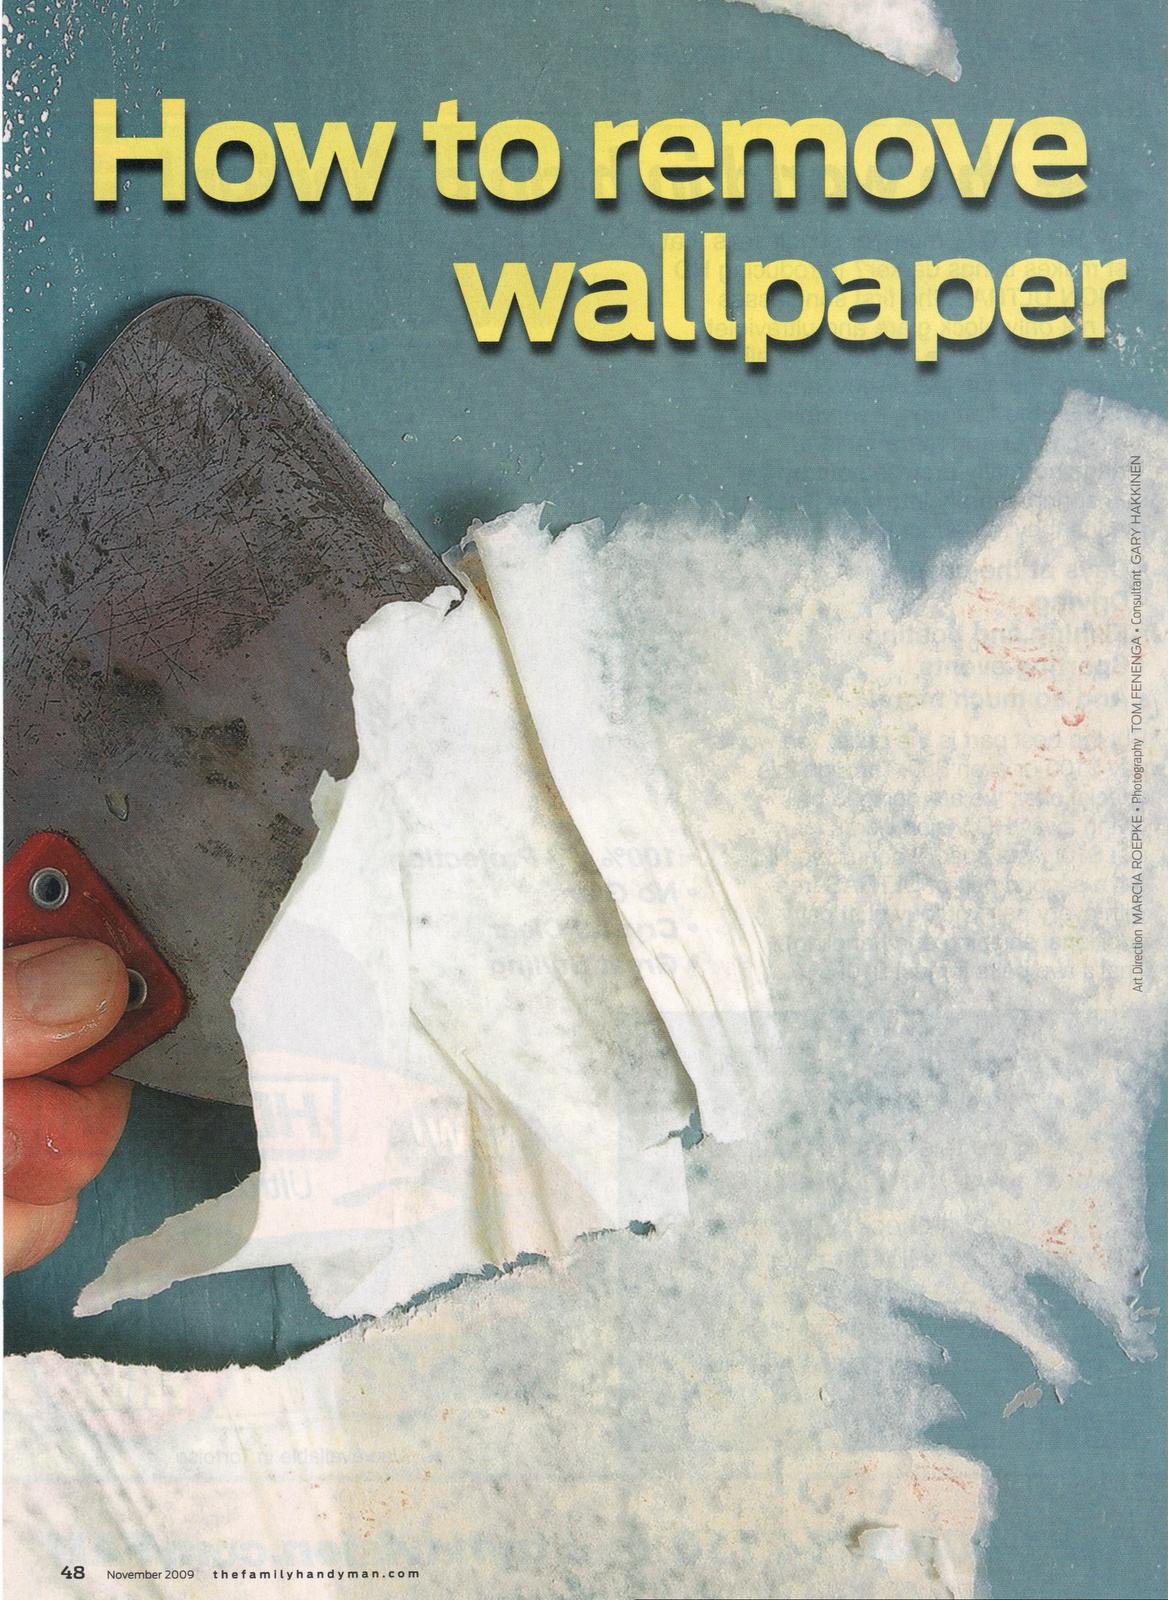 Wallpaper How To Remove Wallpaper Hgtv Party Invitations Ideas 1168x1600